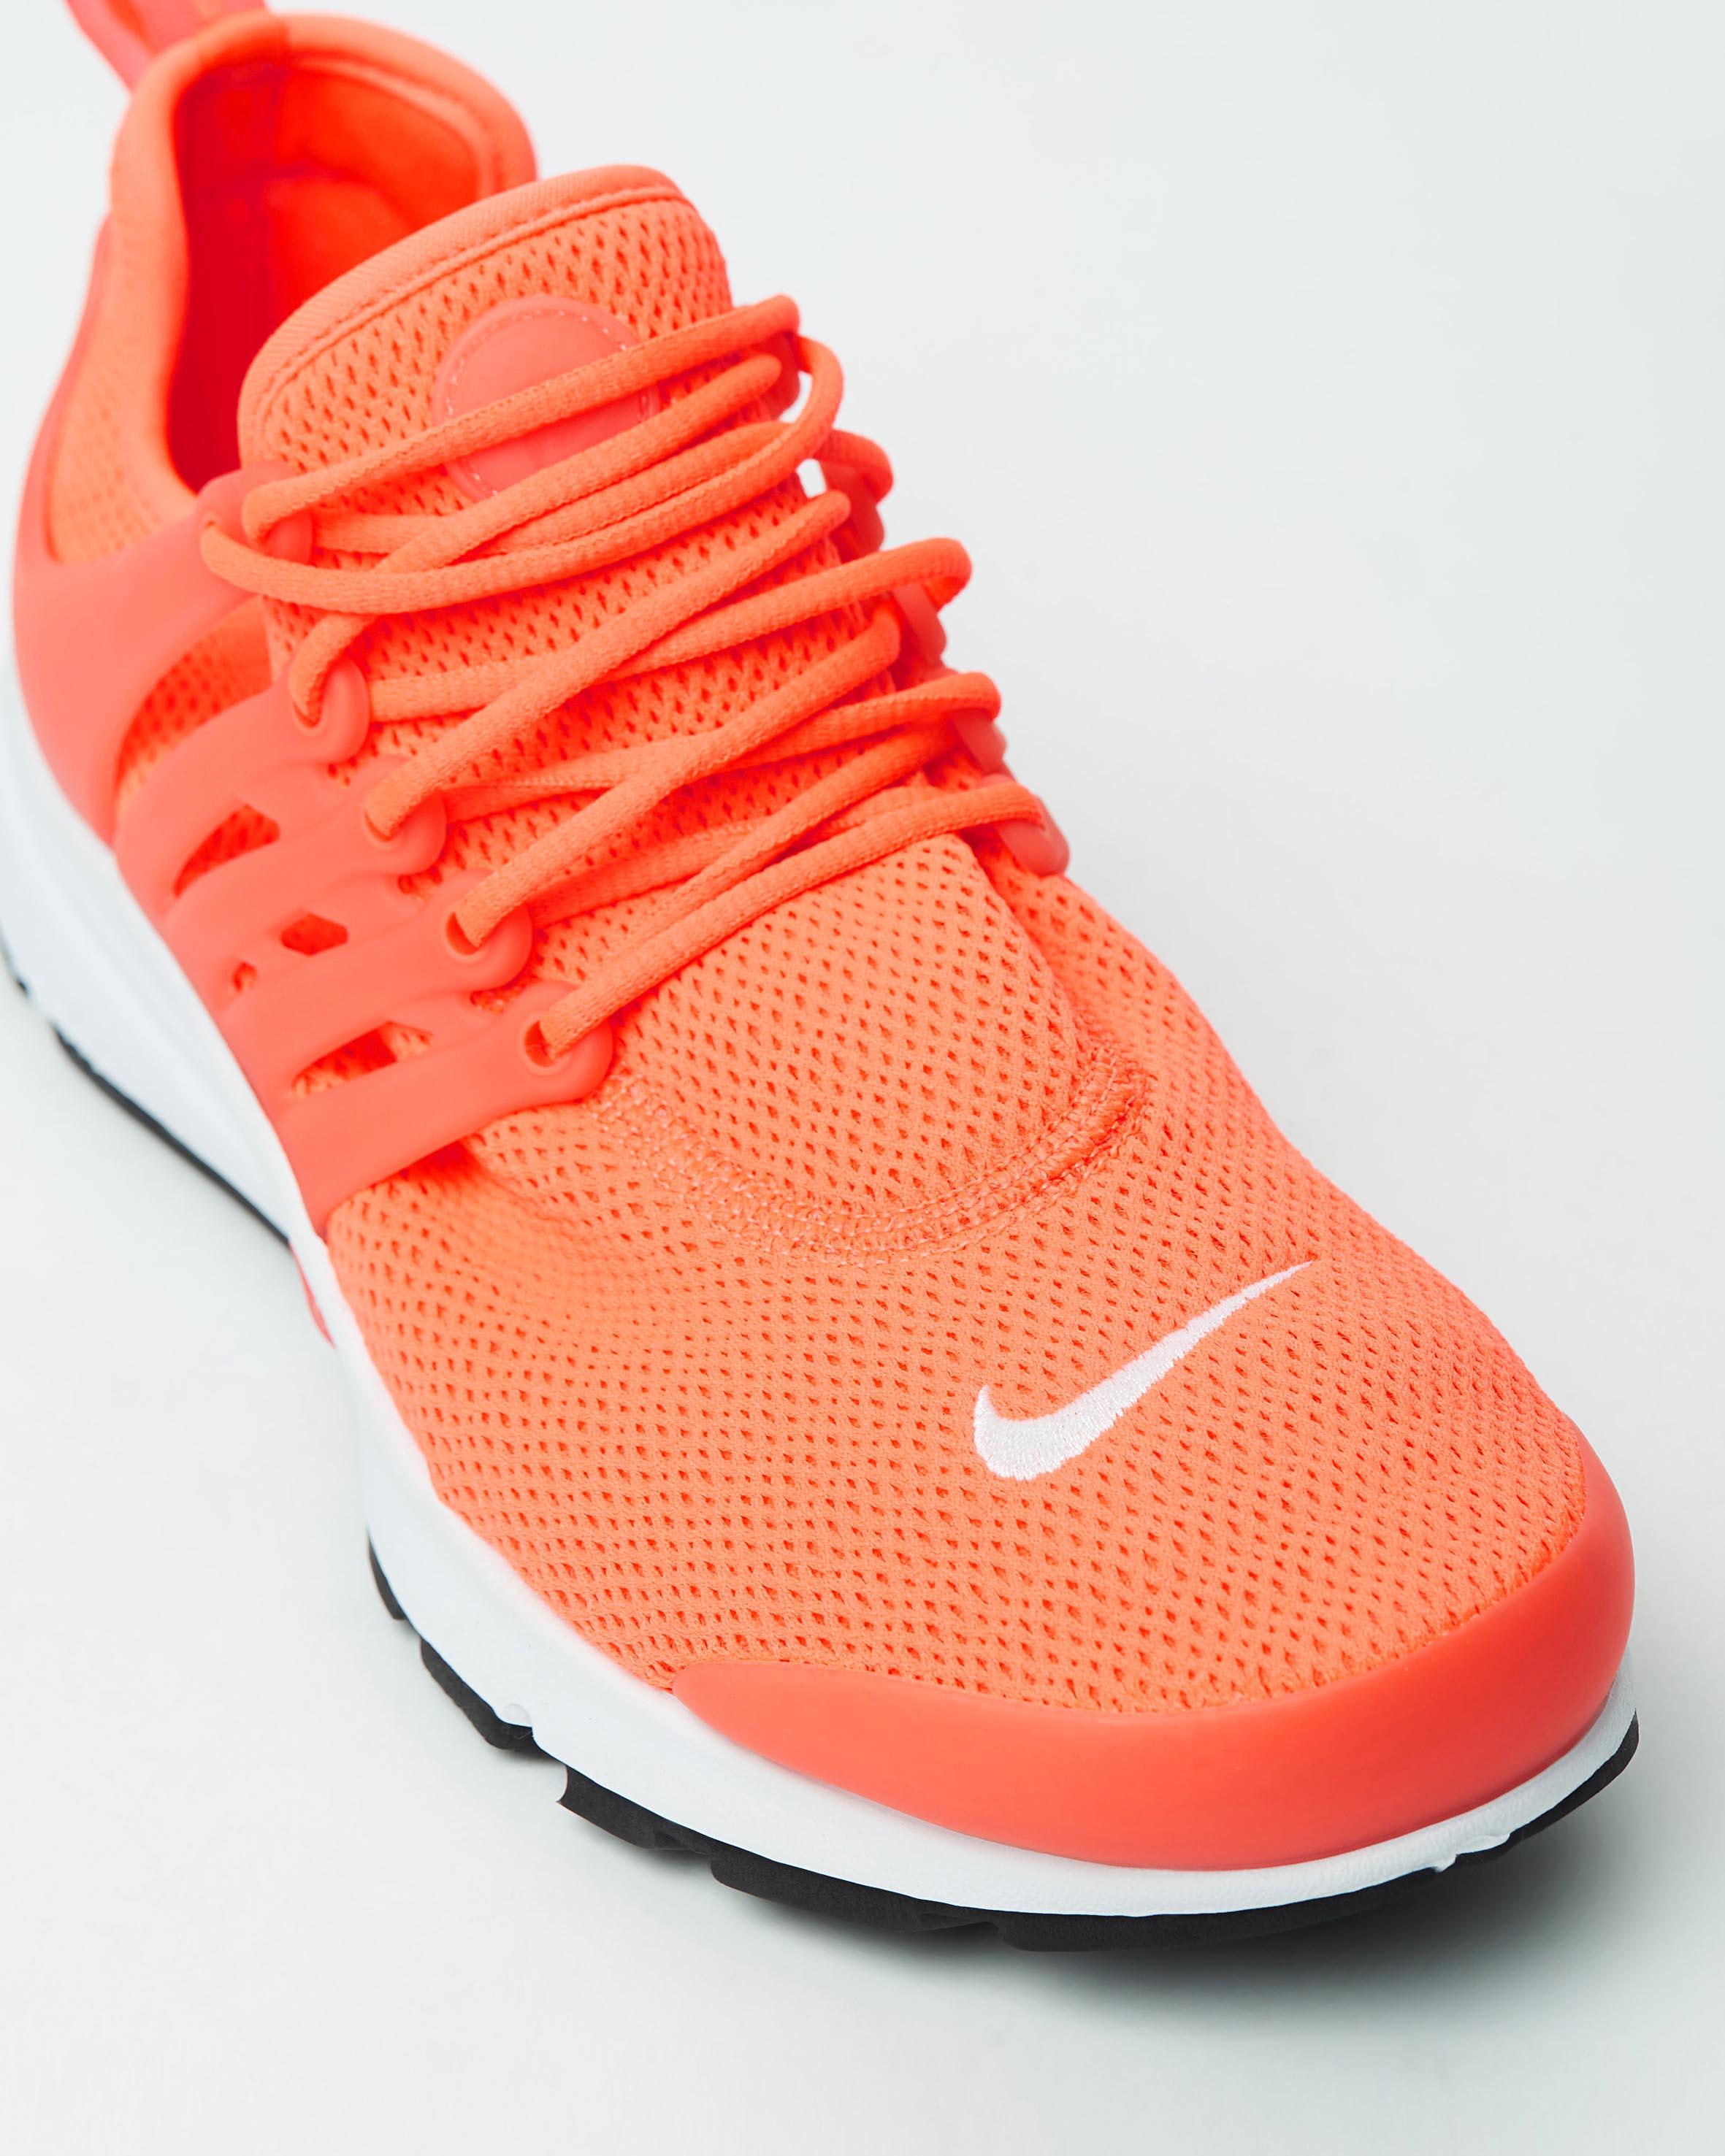 Buy \u003e womens nike presto shoes Limit